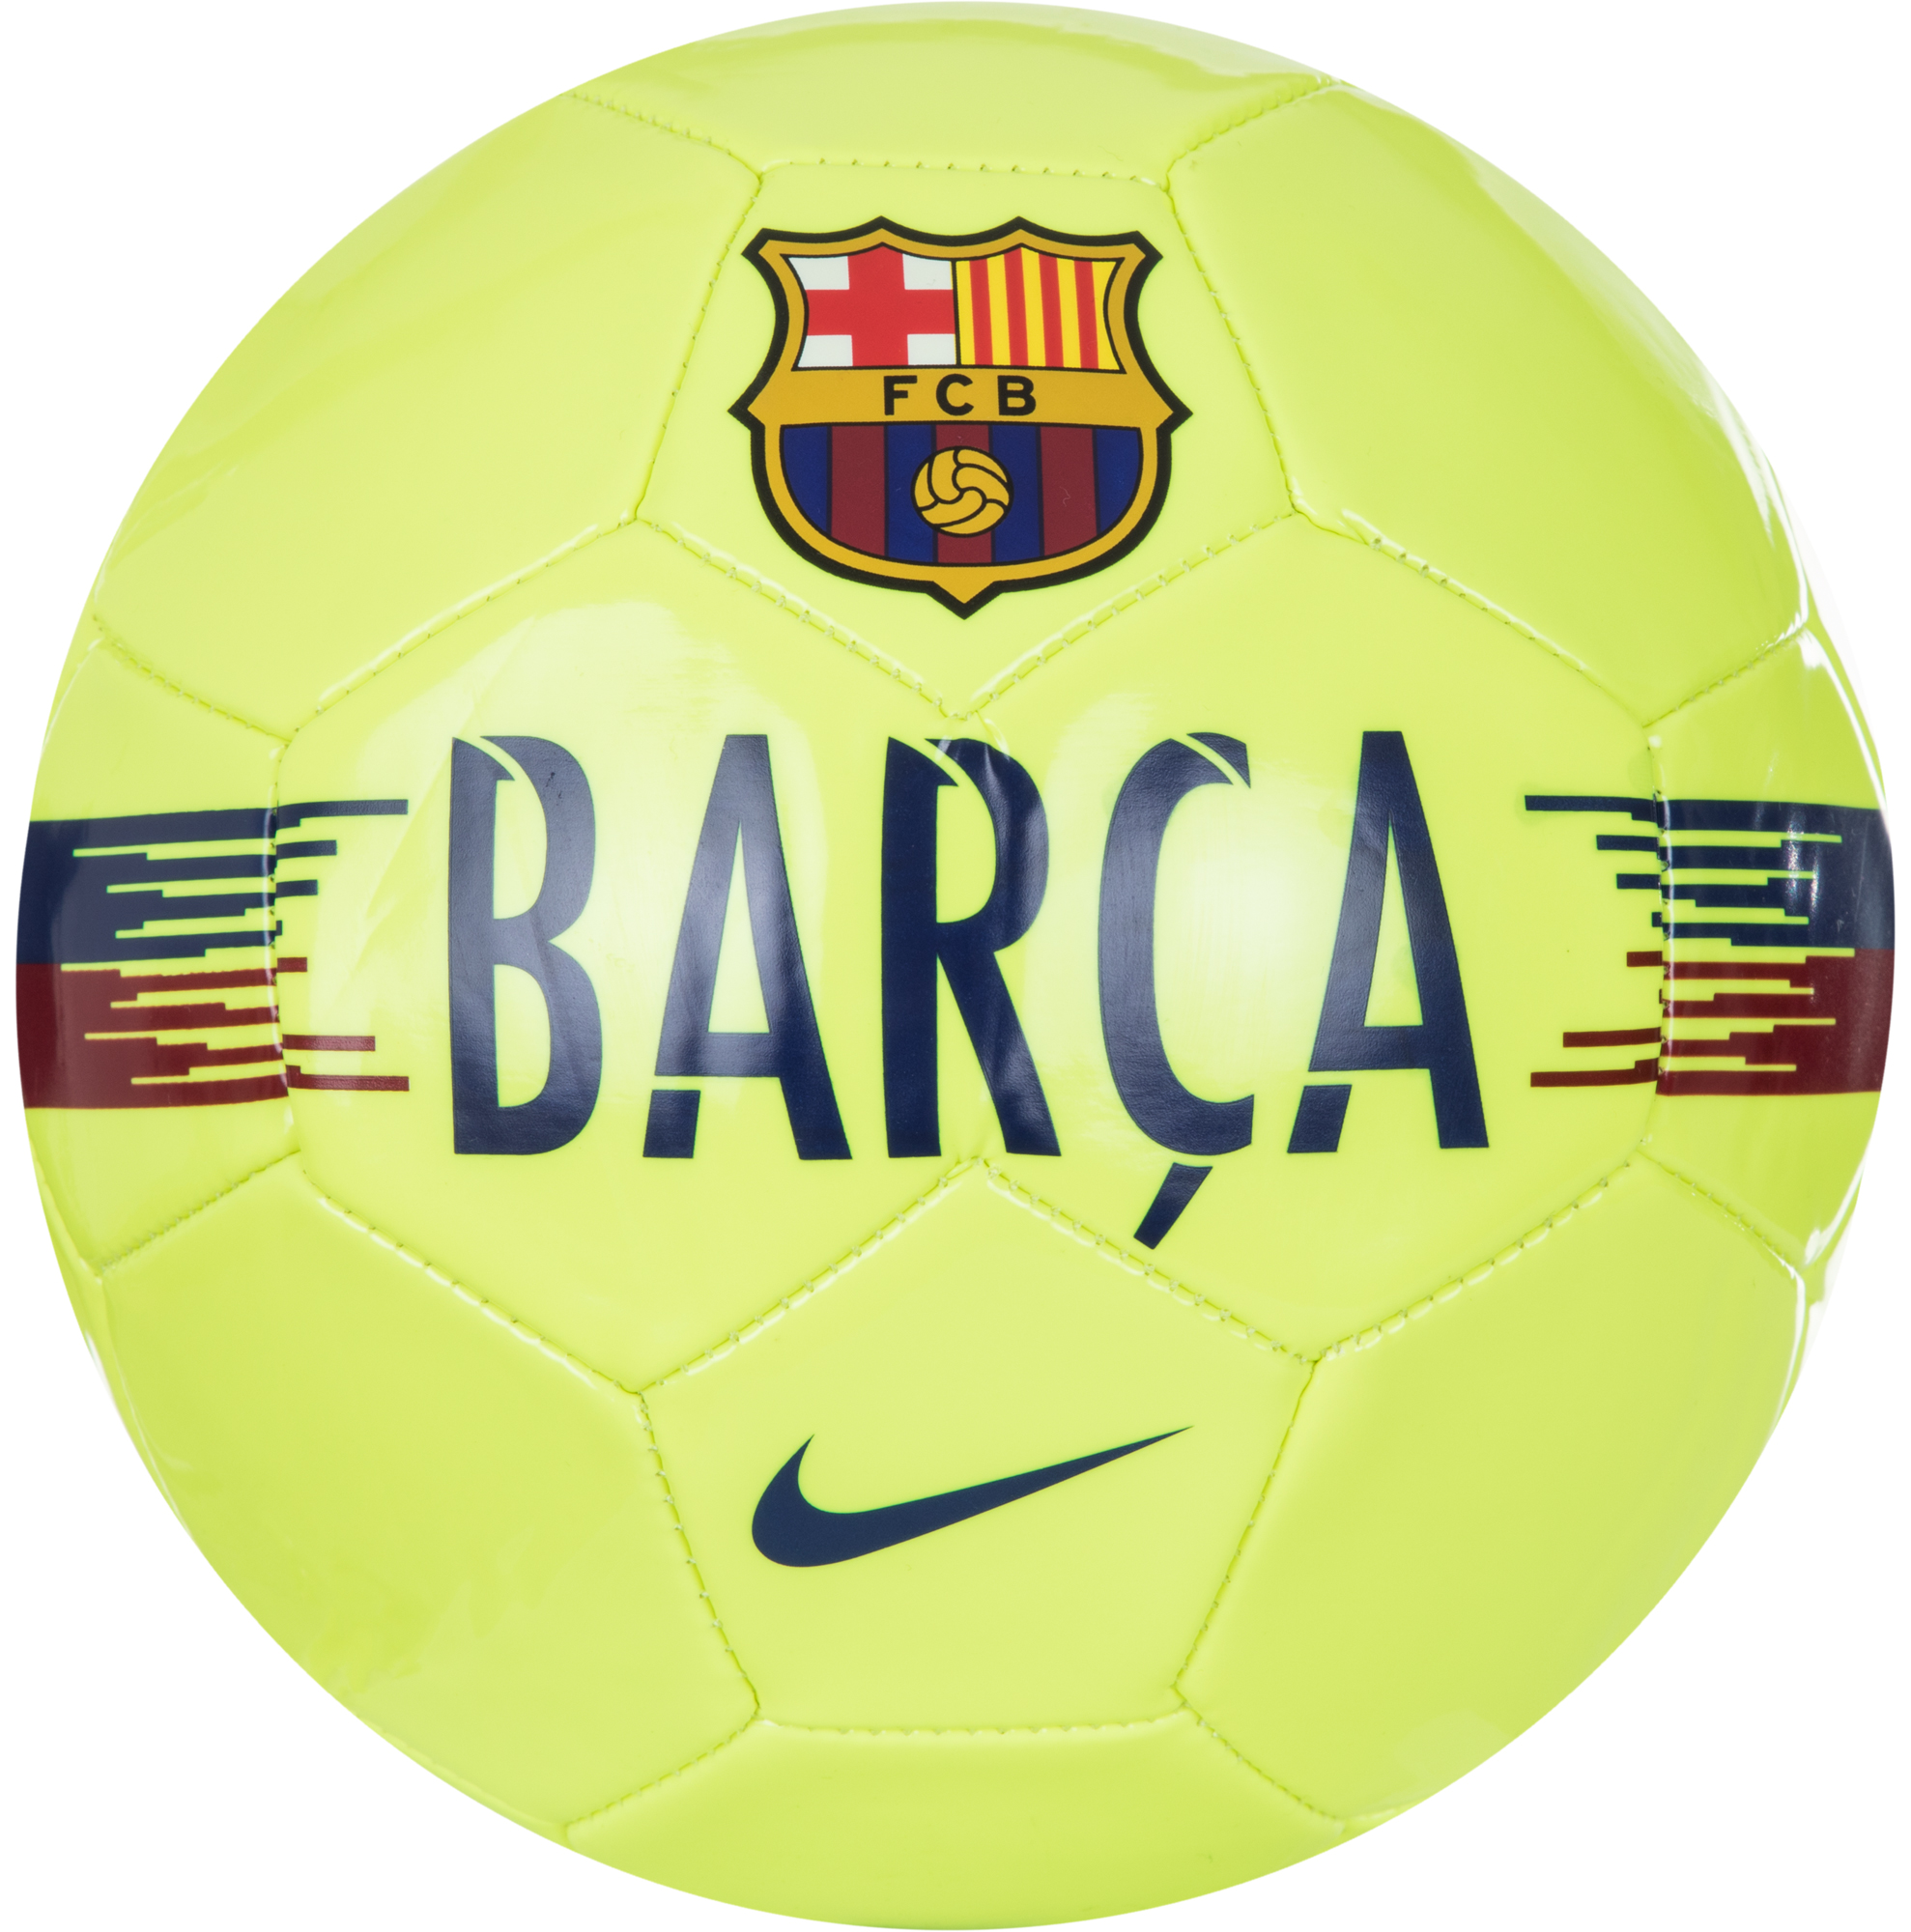 Nike Мяч футбольный Nike FC Barcelona Supporters, размер 5 атрибутика шапка вязаная fc barcelona арт 115102